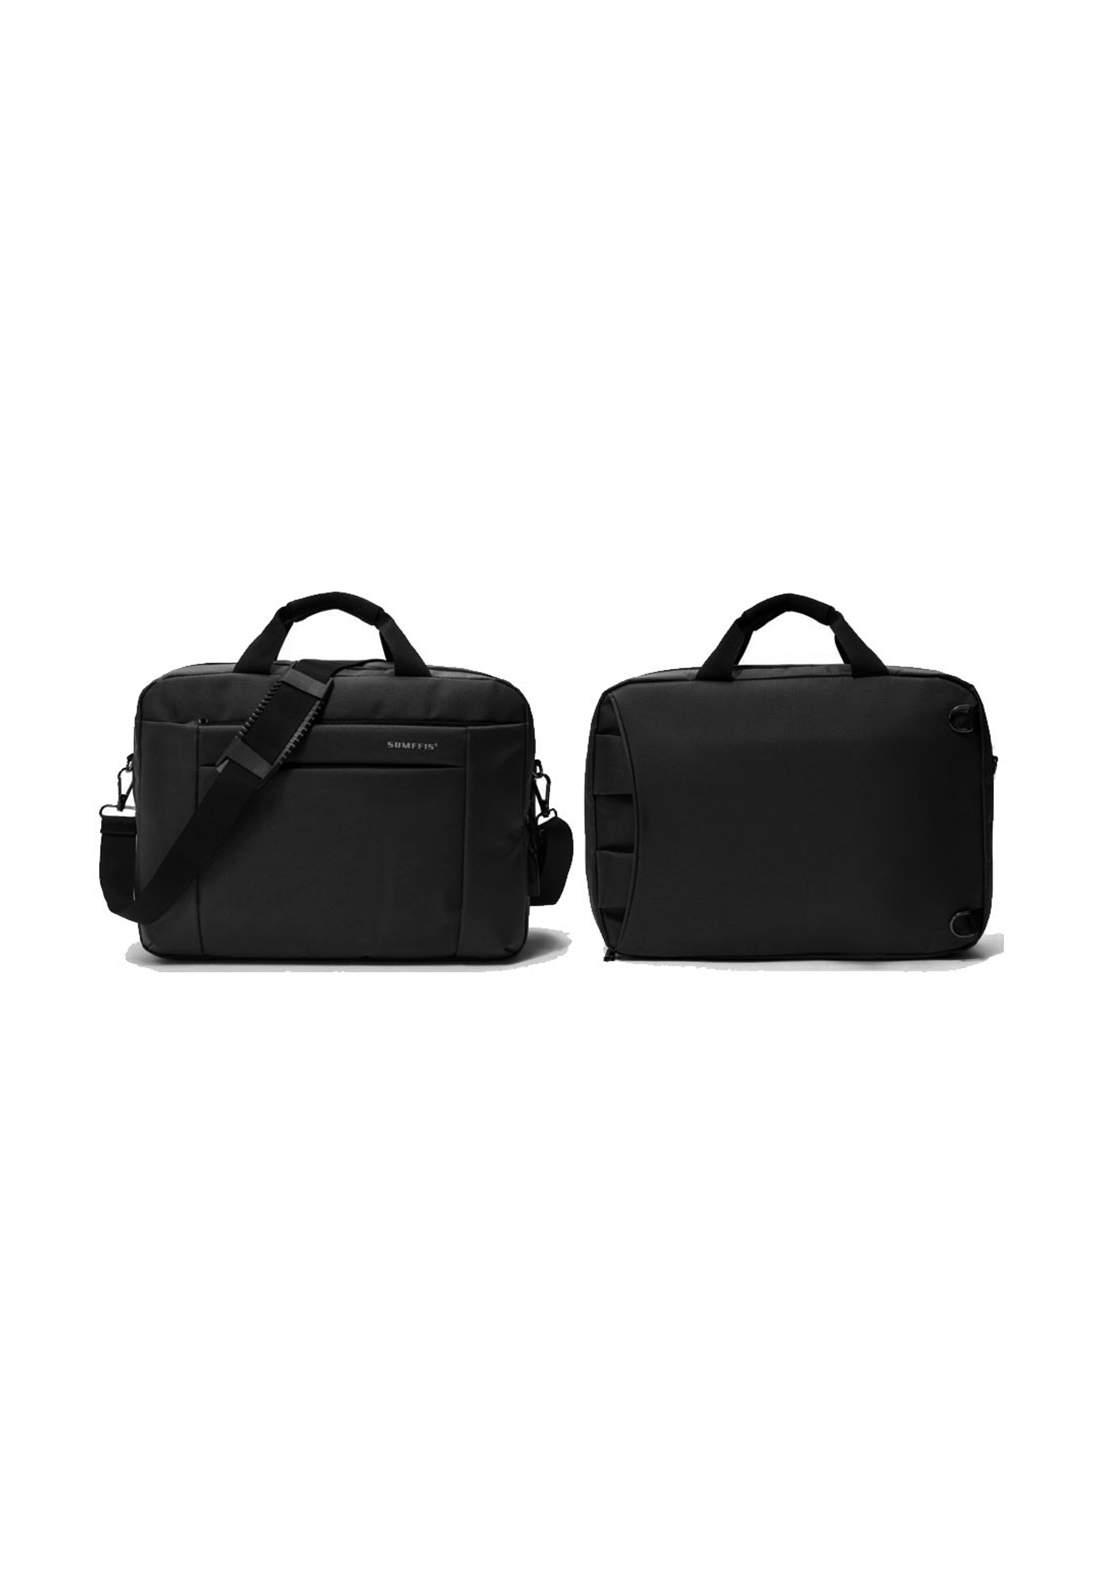 "SS-9160   15.6""Laptop Bag - Black  حقيبة لابتوب"